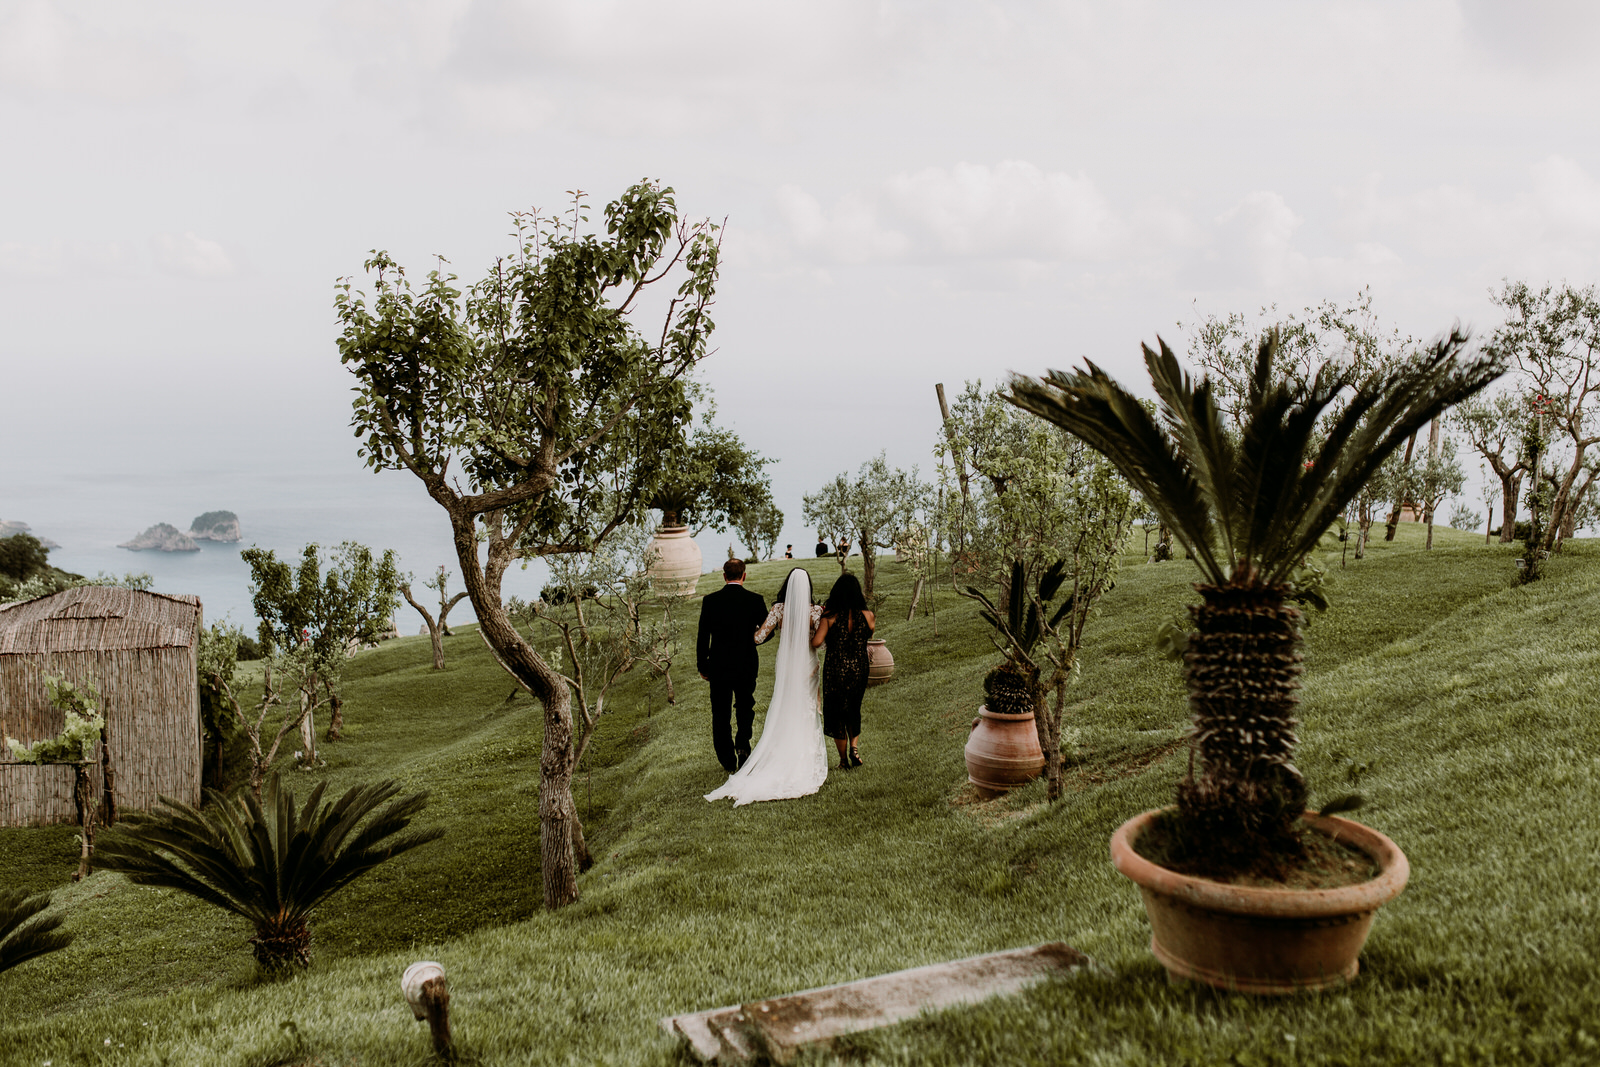 Fotomagoria Best 0f 2018 Wedding Photographer Italy12.jpg